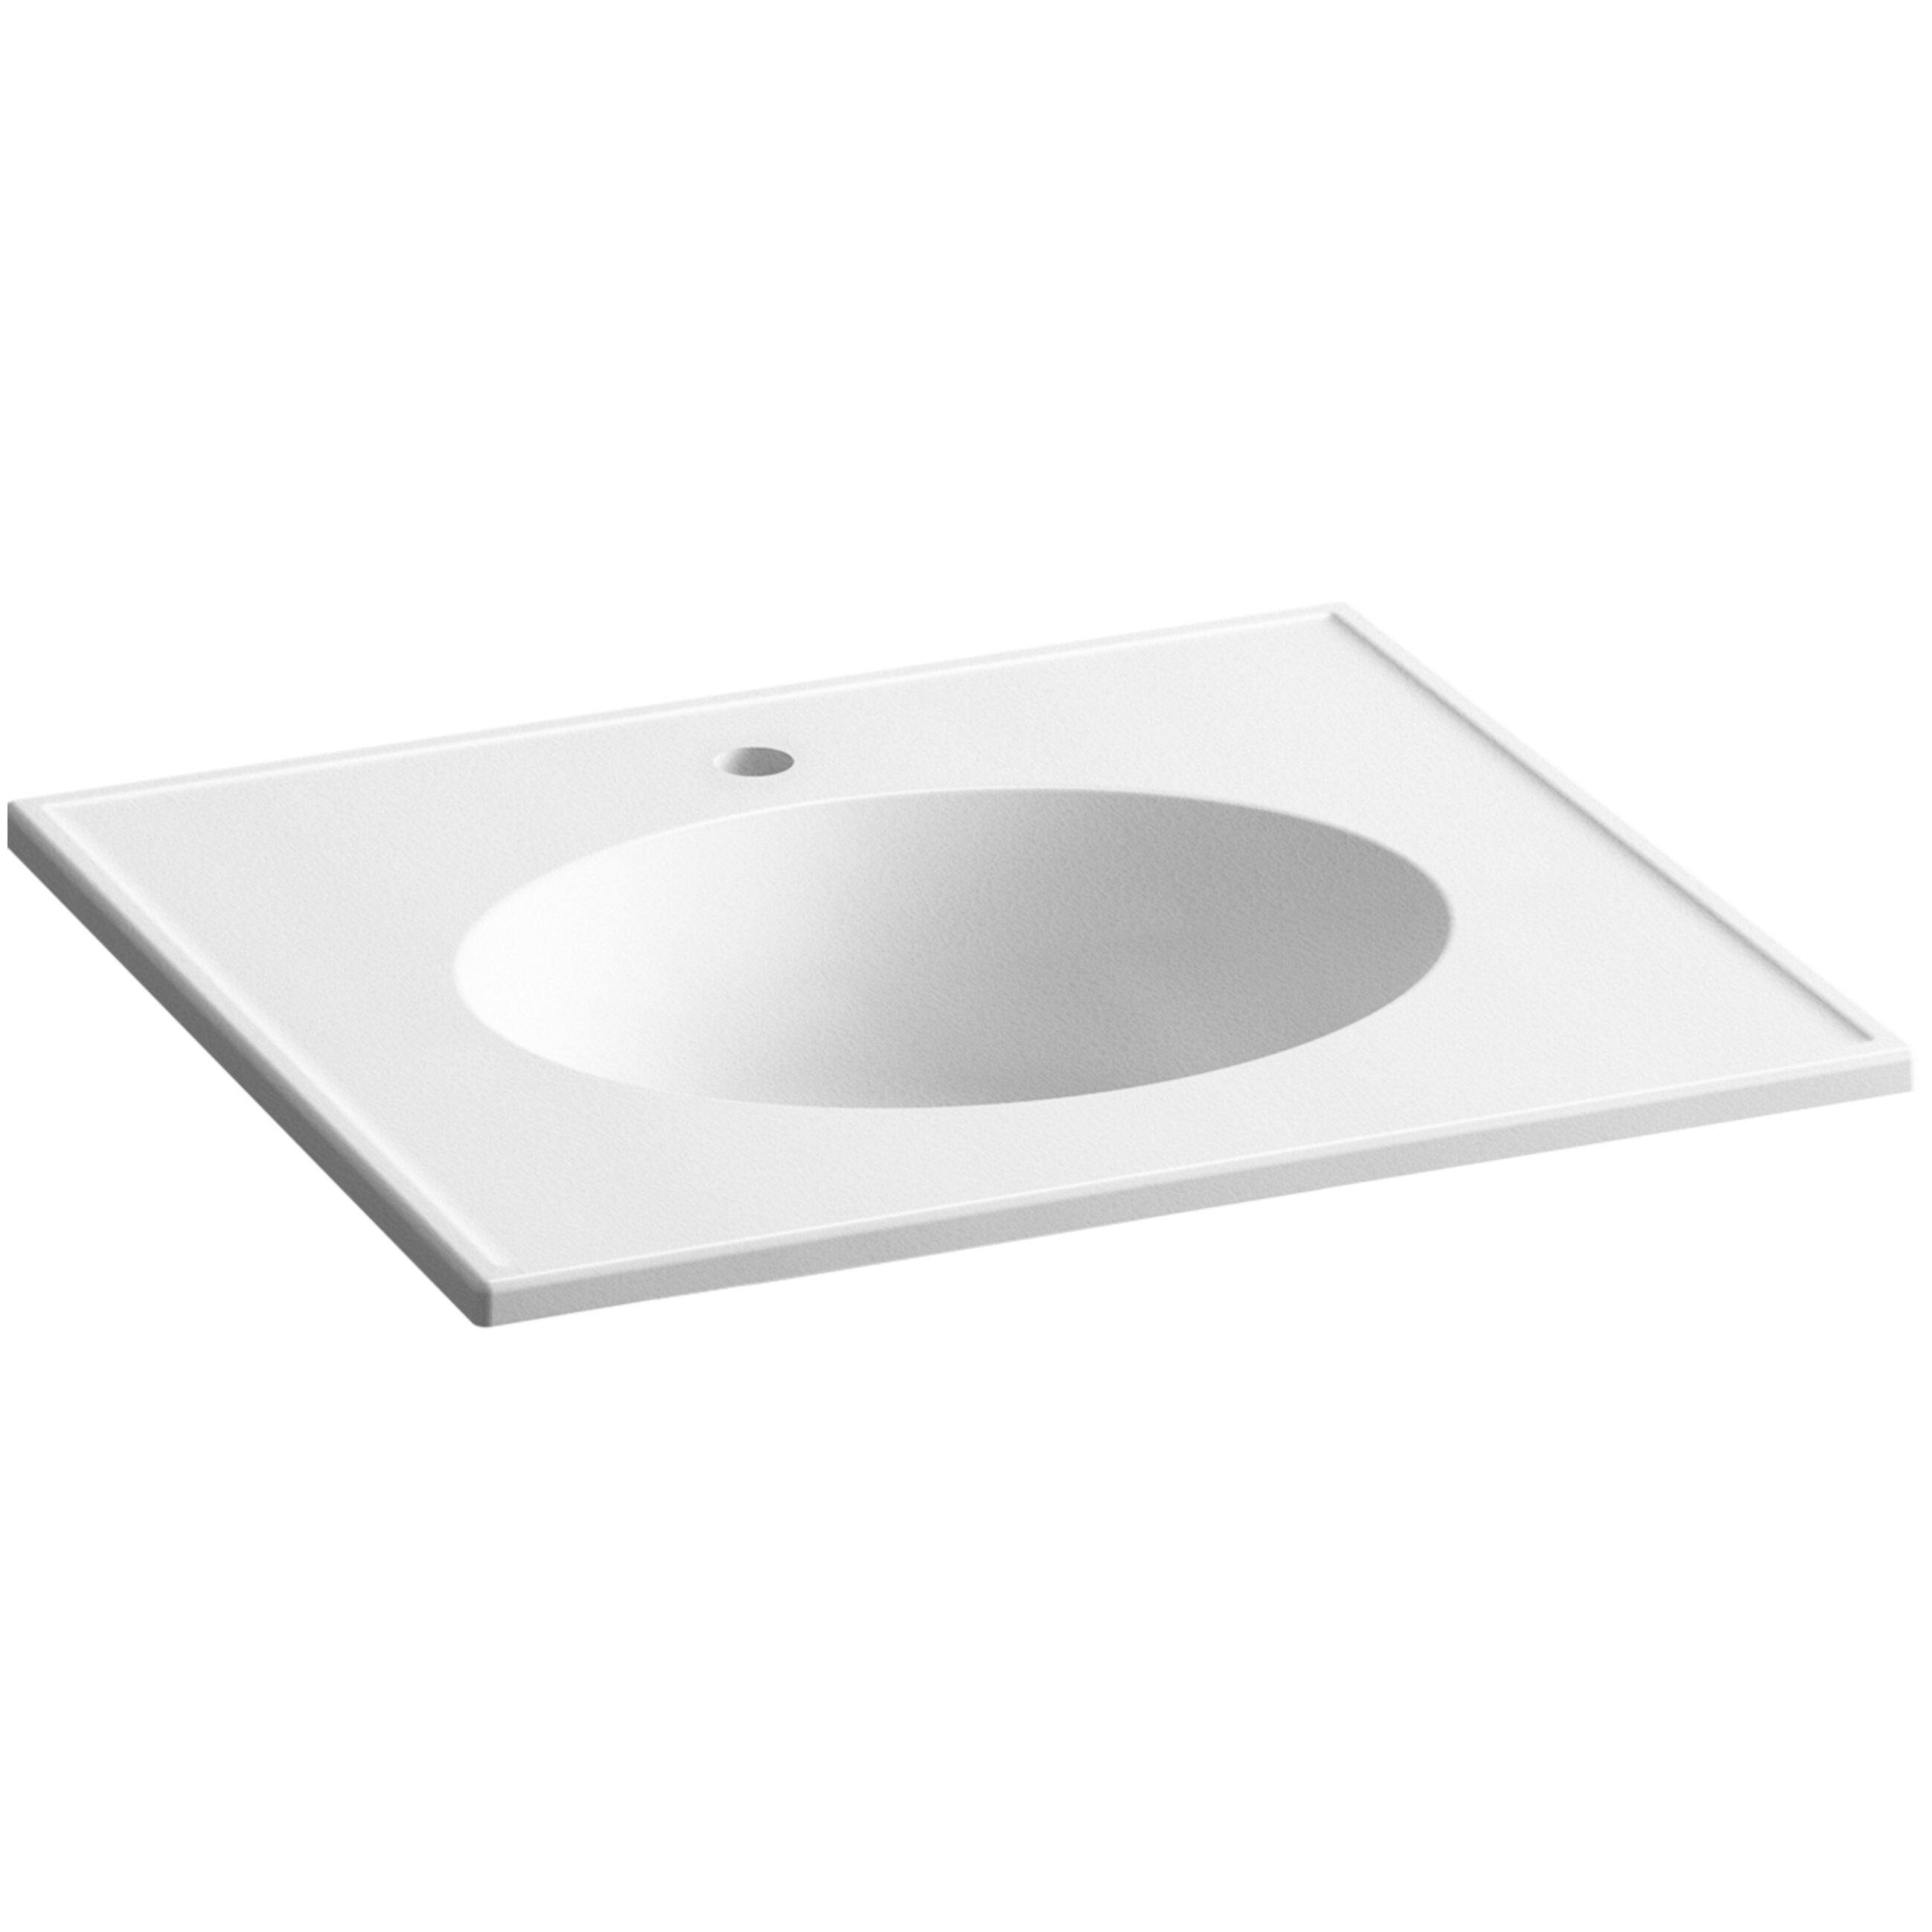 kohler ceramic impressions 25 oval vanity top bathroom sink with single faucet hole wayfair. Black Bedroom Furniture Sets. Home Design Ideas